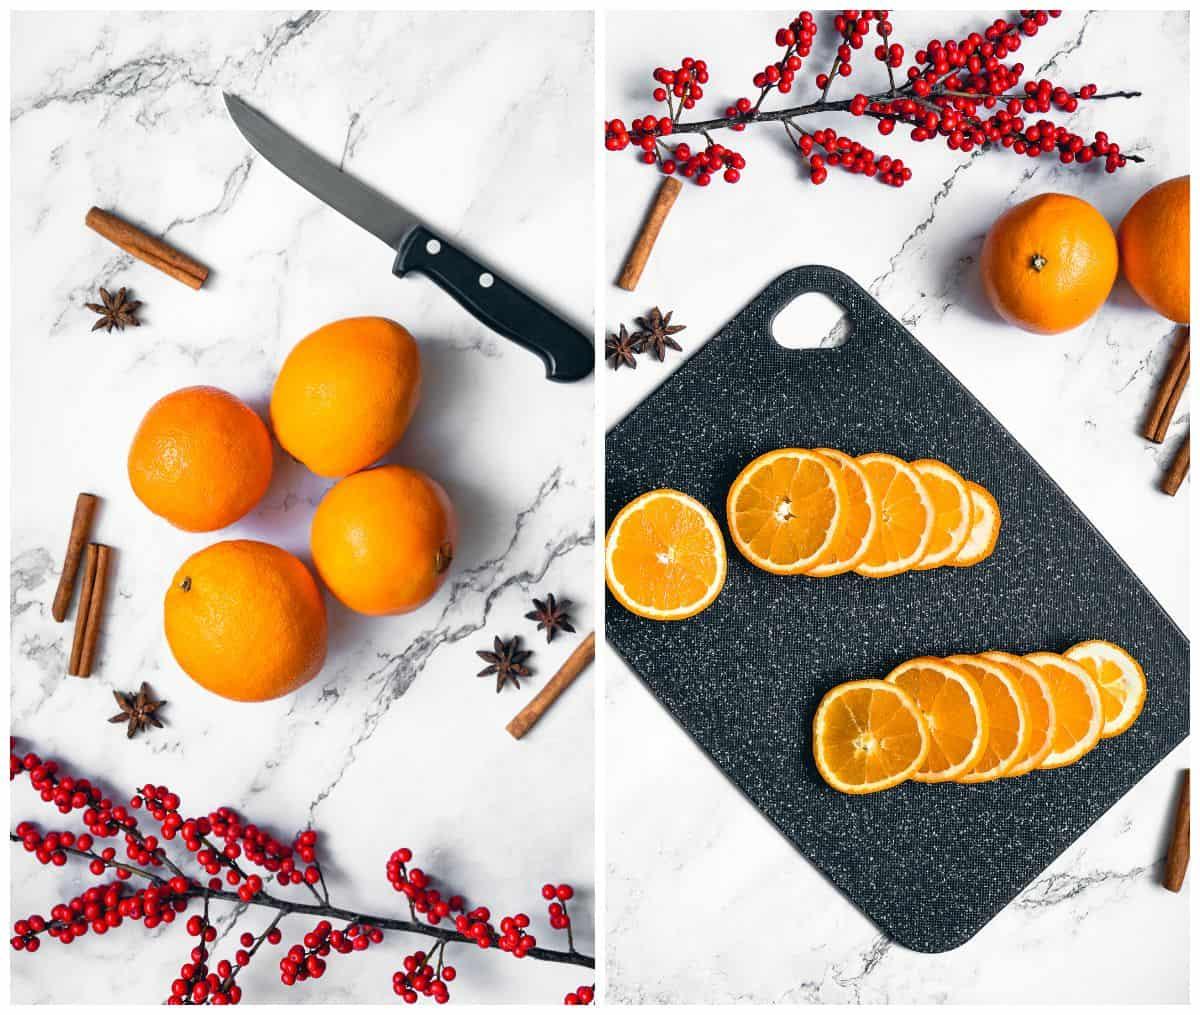 dried orange slices step by step photos